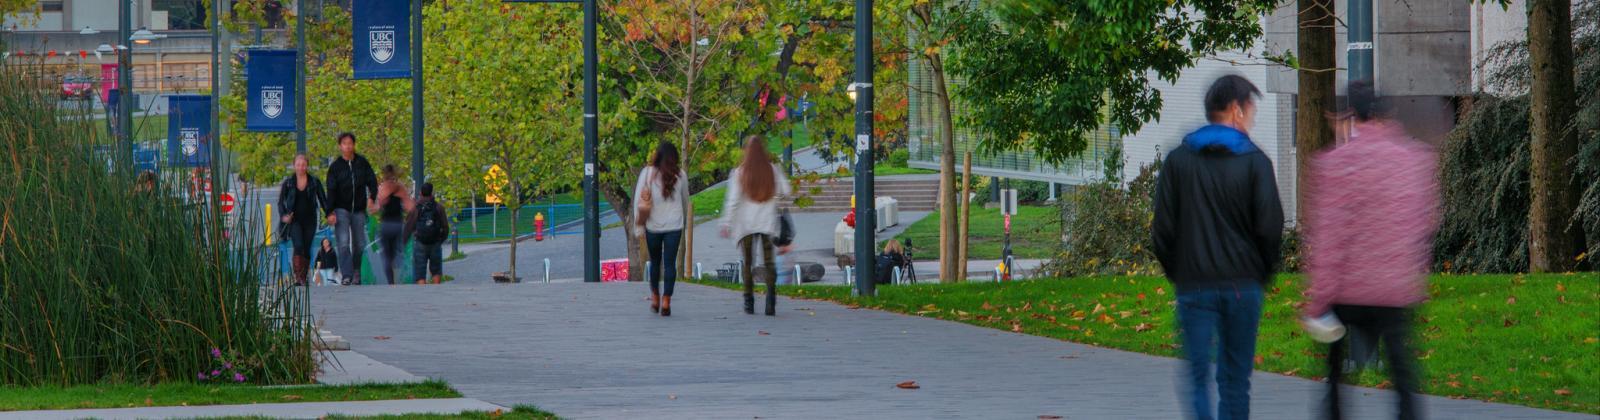 UBC students walking across UBC campus with fading light